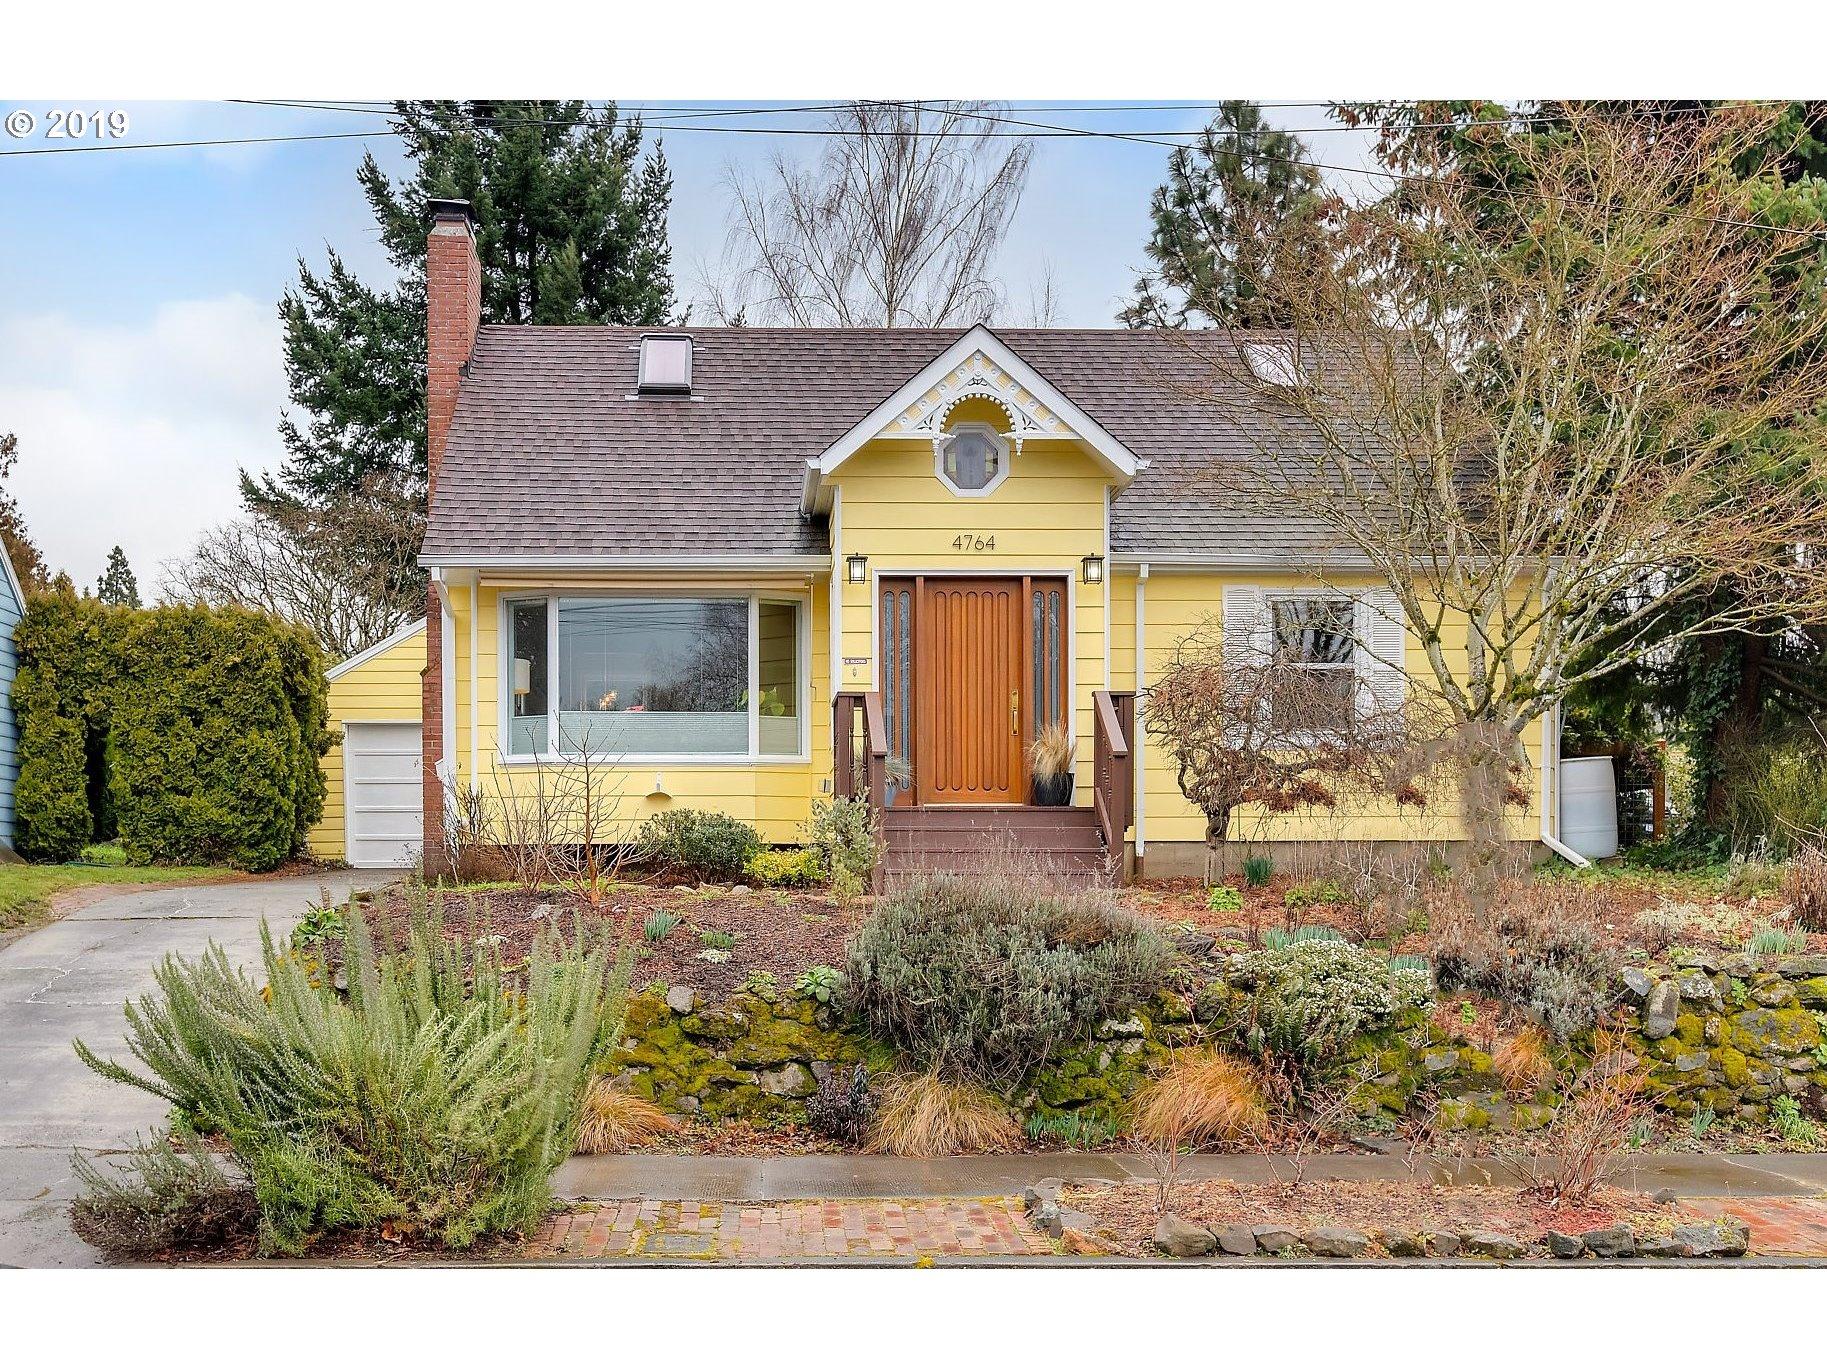 4764 SE 34TH AVE, Portland OR 97202